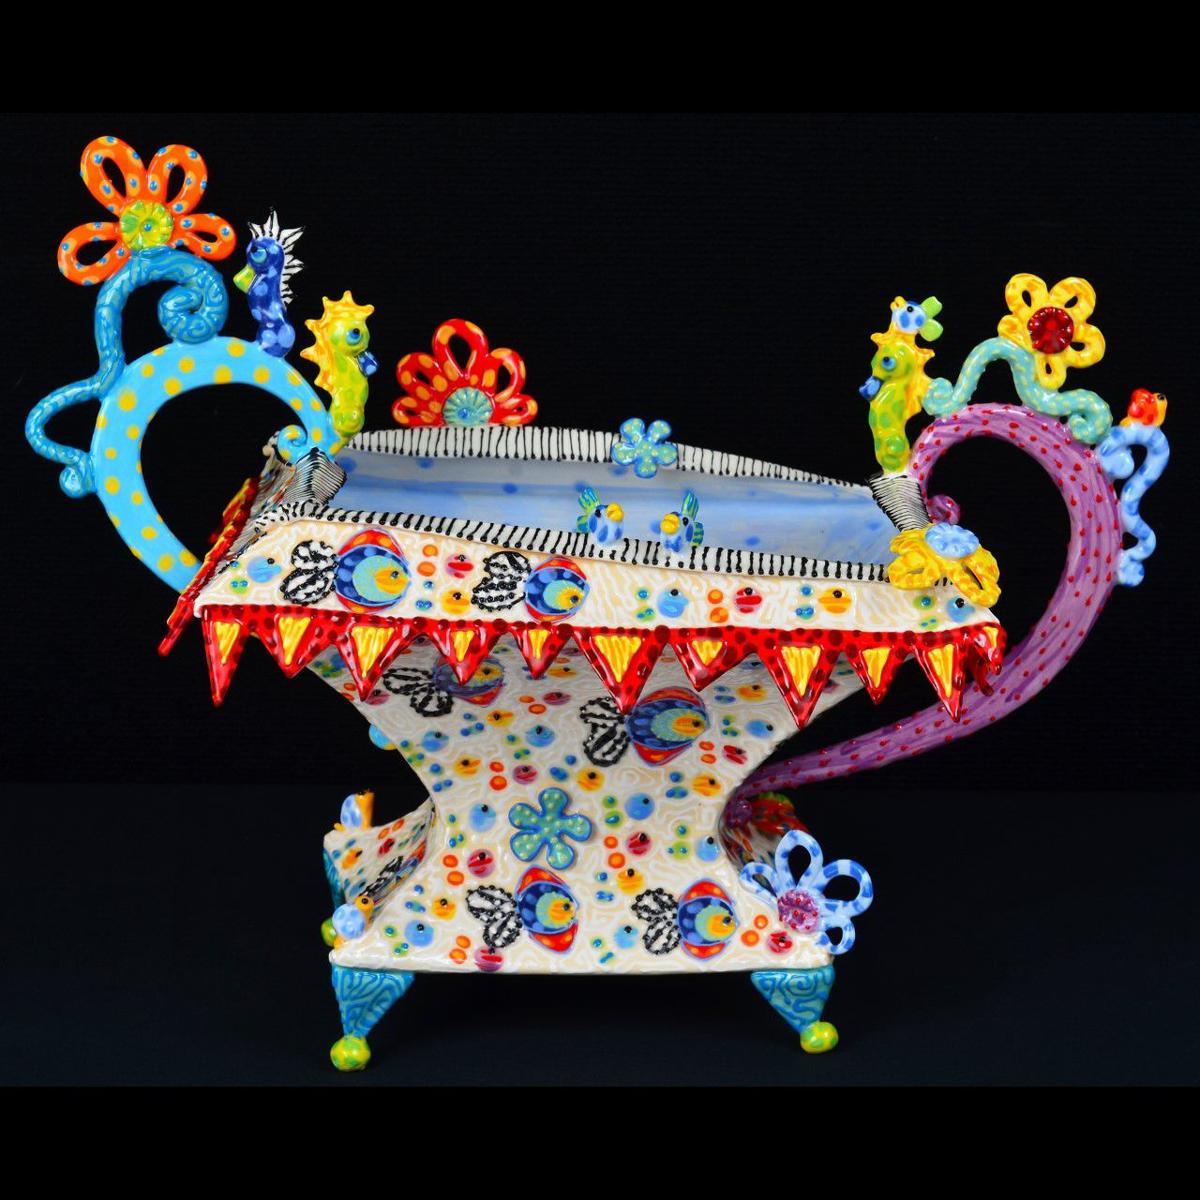 32nd Annual Englewood Bank & Trust Invitational Art Festival